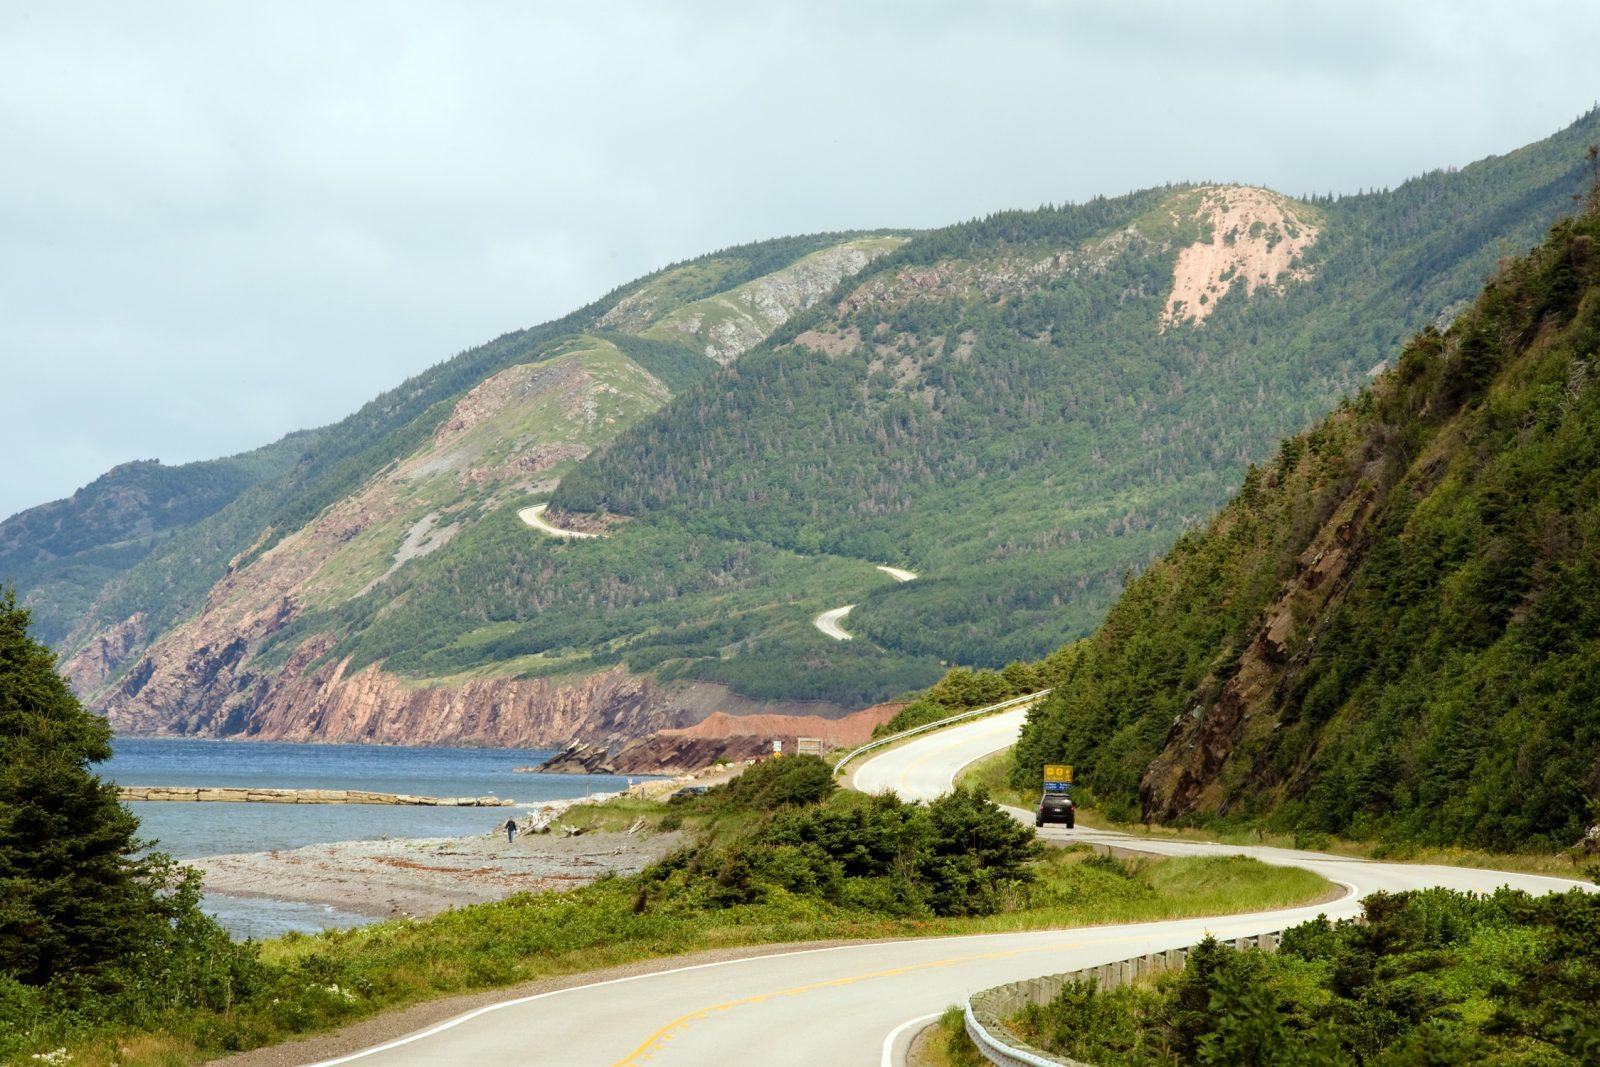 Ever-so-picturesque Cabot Trail in Cape Breton. Natalya Bratslavsky / ShutterStock